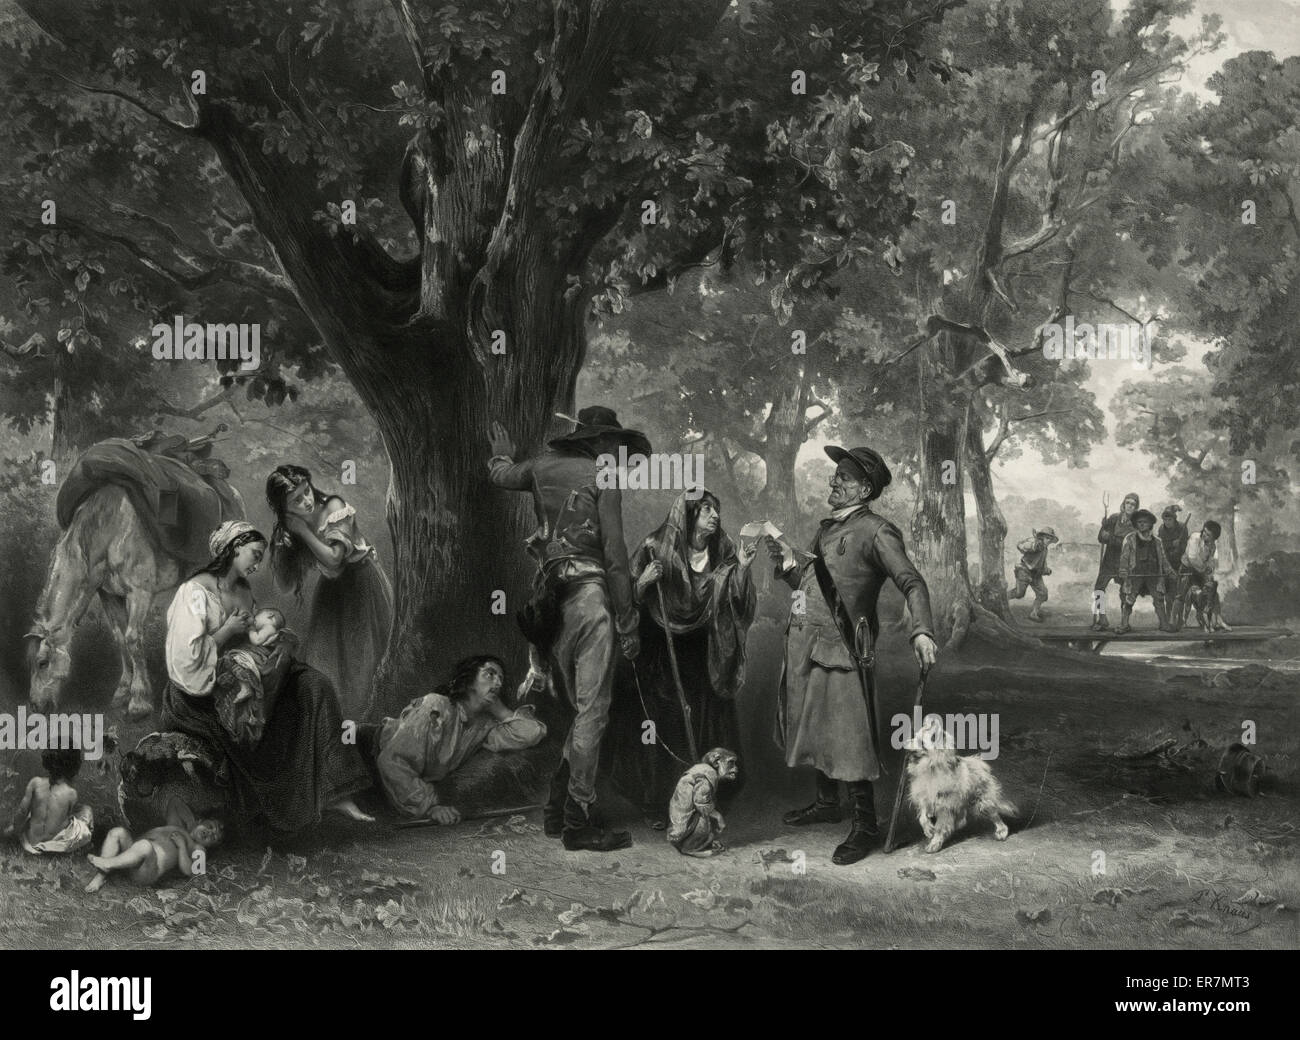 Un campement de Bohemiens. - Stock Image